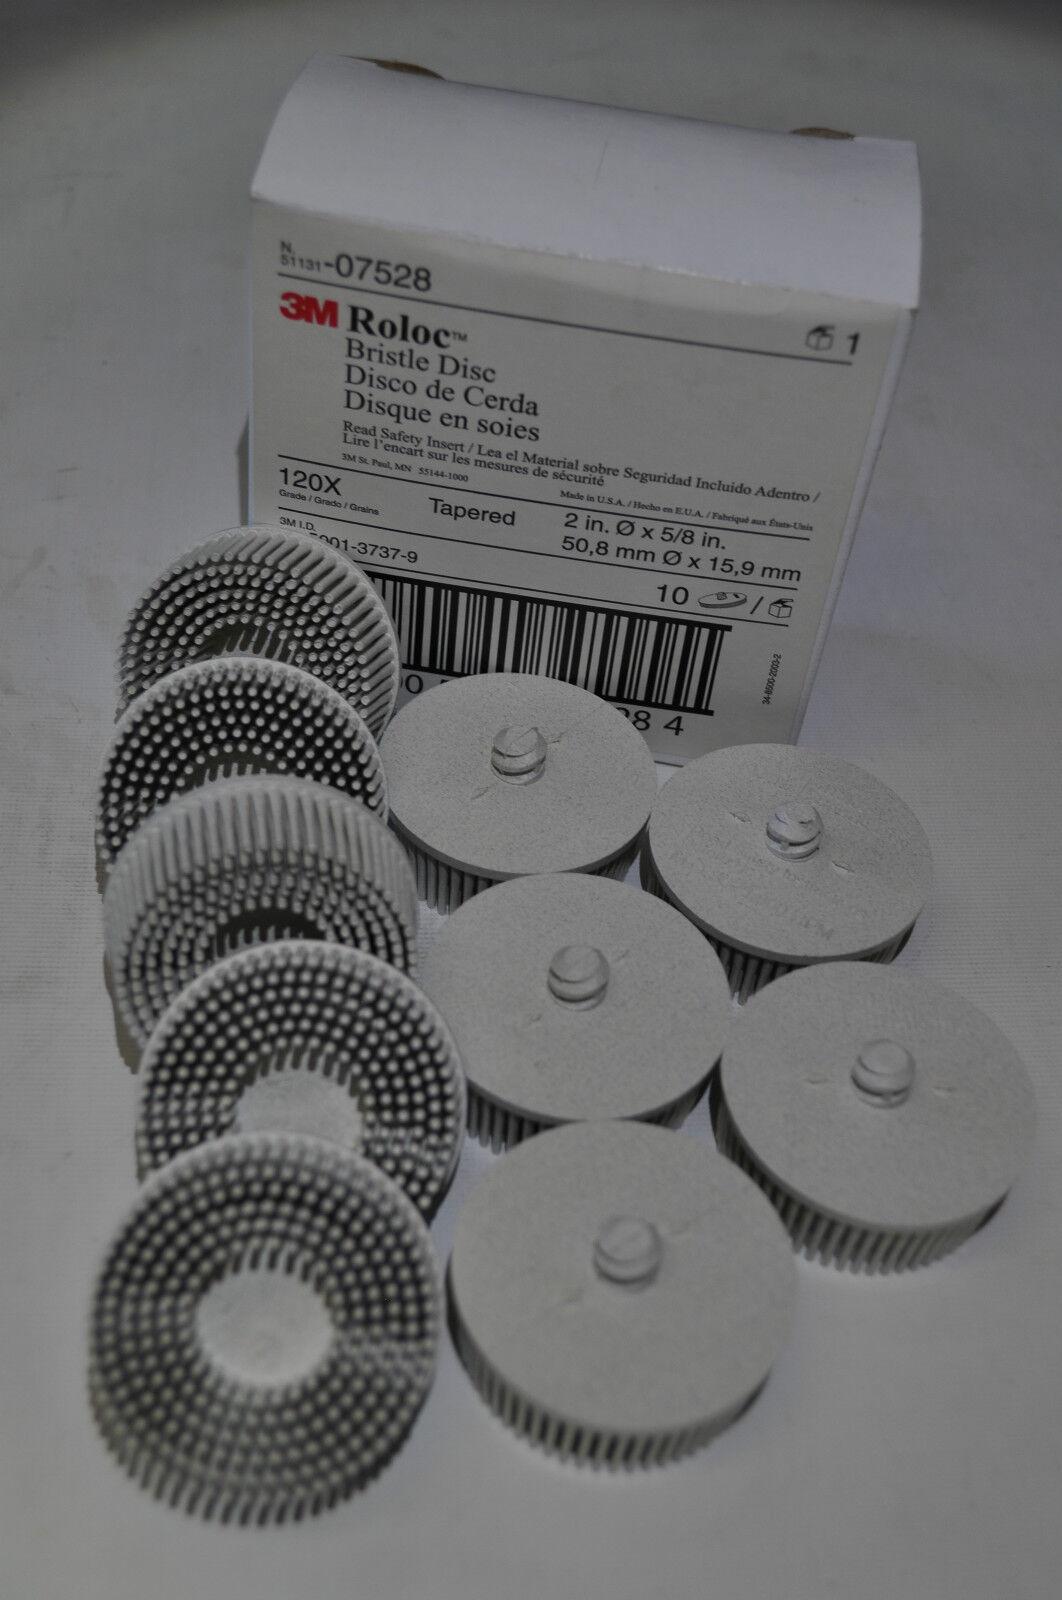 3M Scotch-Brite Bristle Disc - 2 in Dia Quick Change Attachment 120 Grit - 07528